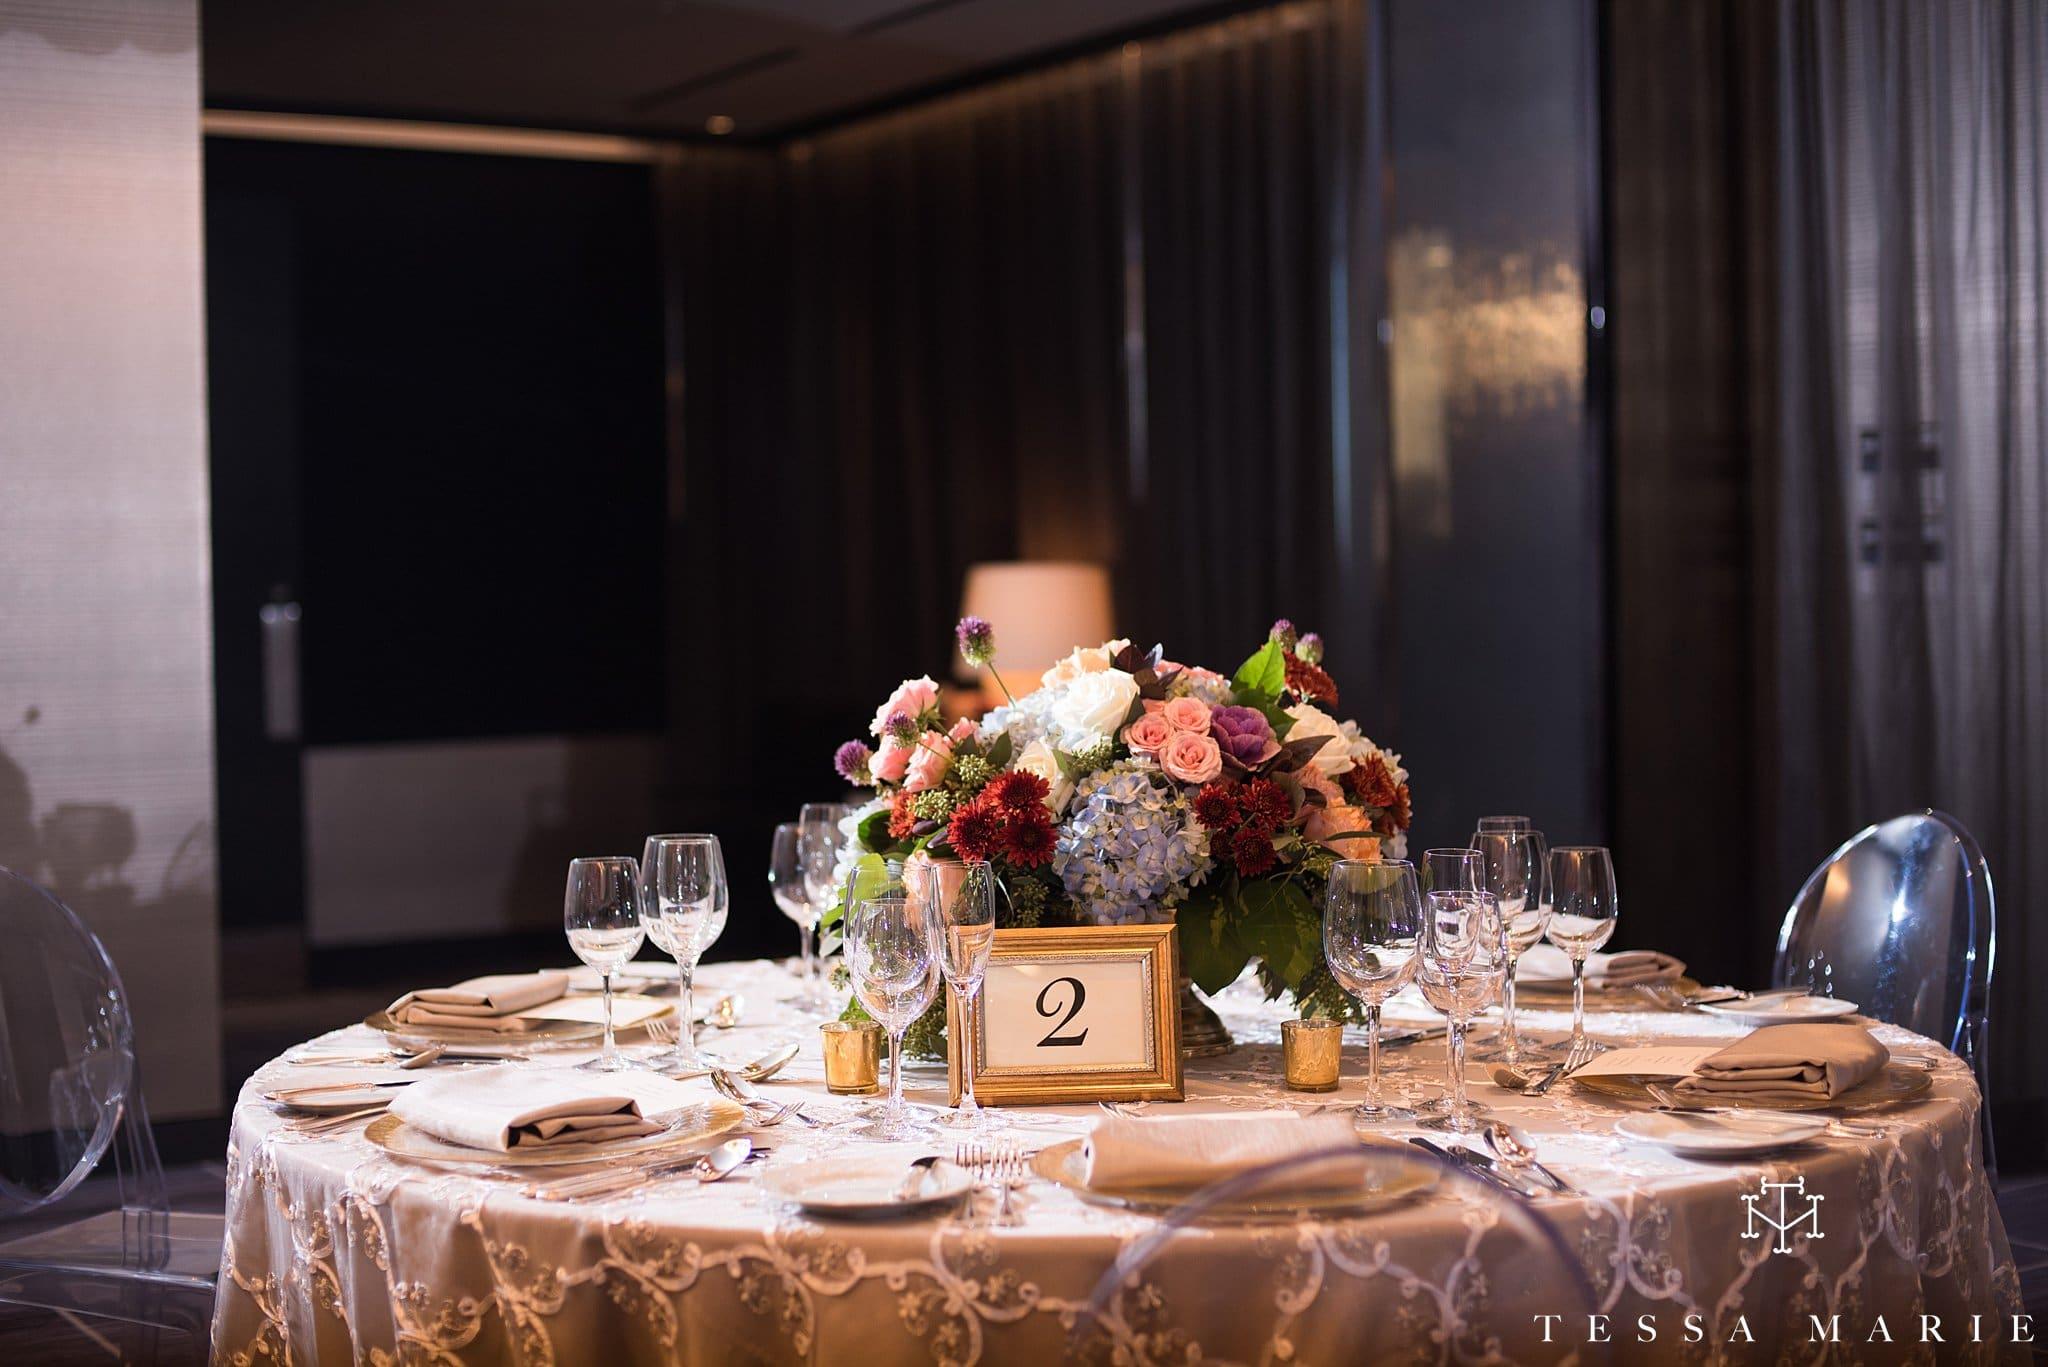 tessa_marie_Weddings_four_seasons_rehersal_dinner_pictures_wedding_atlanta_wedding_getting_married_0005.jpg